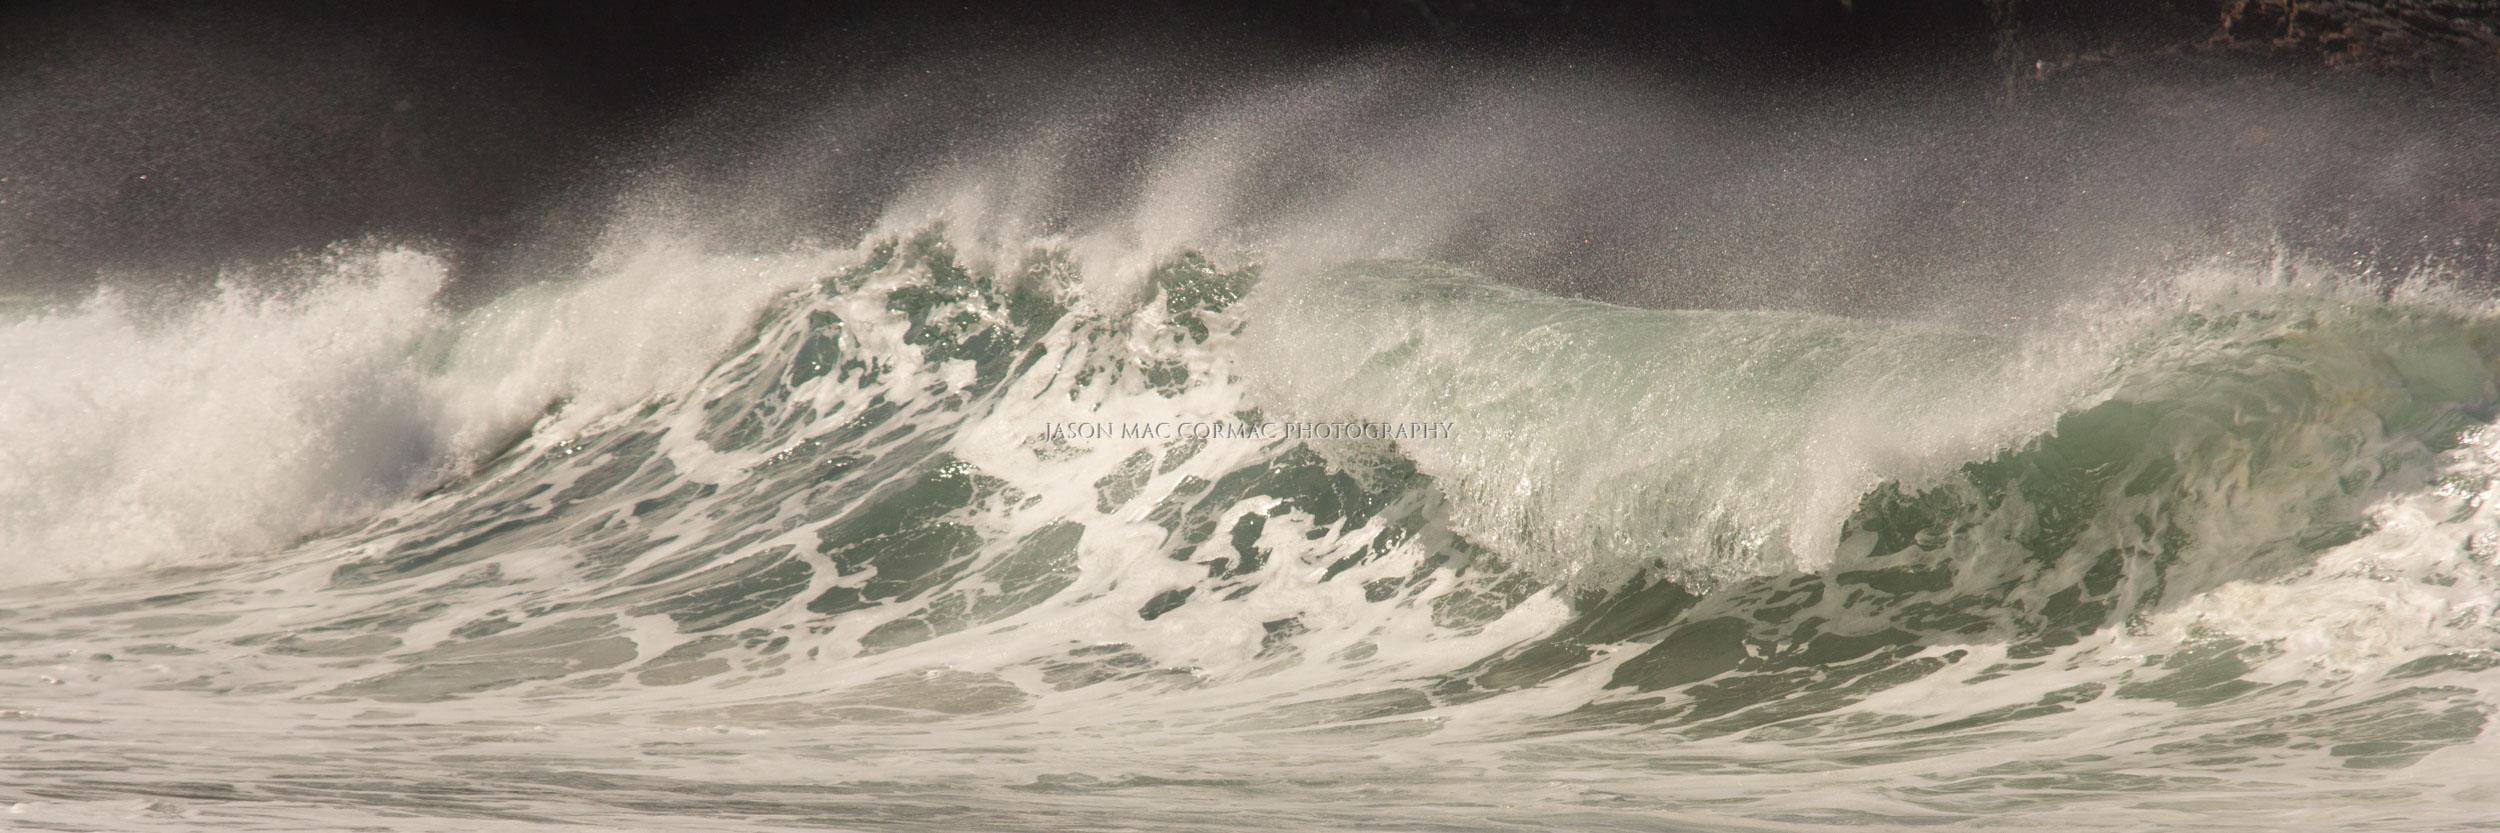 Crashing waves on the Wild Atlantic Way